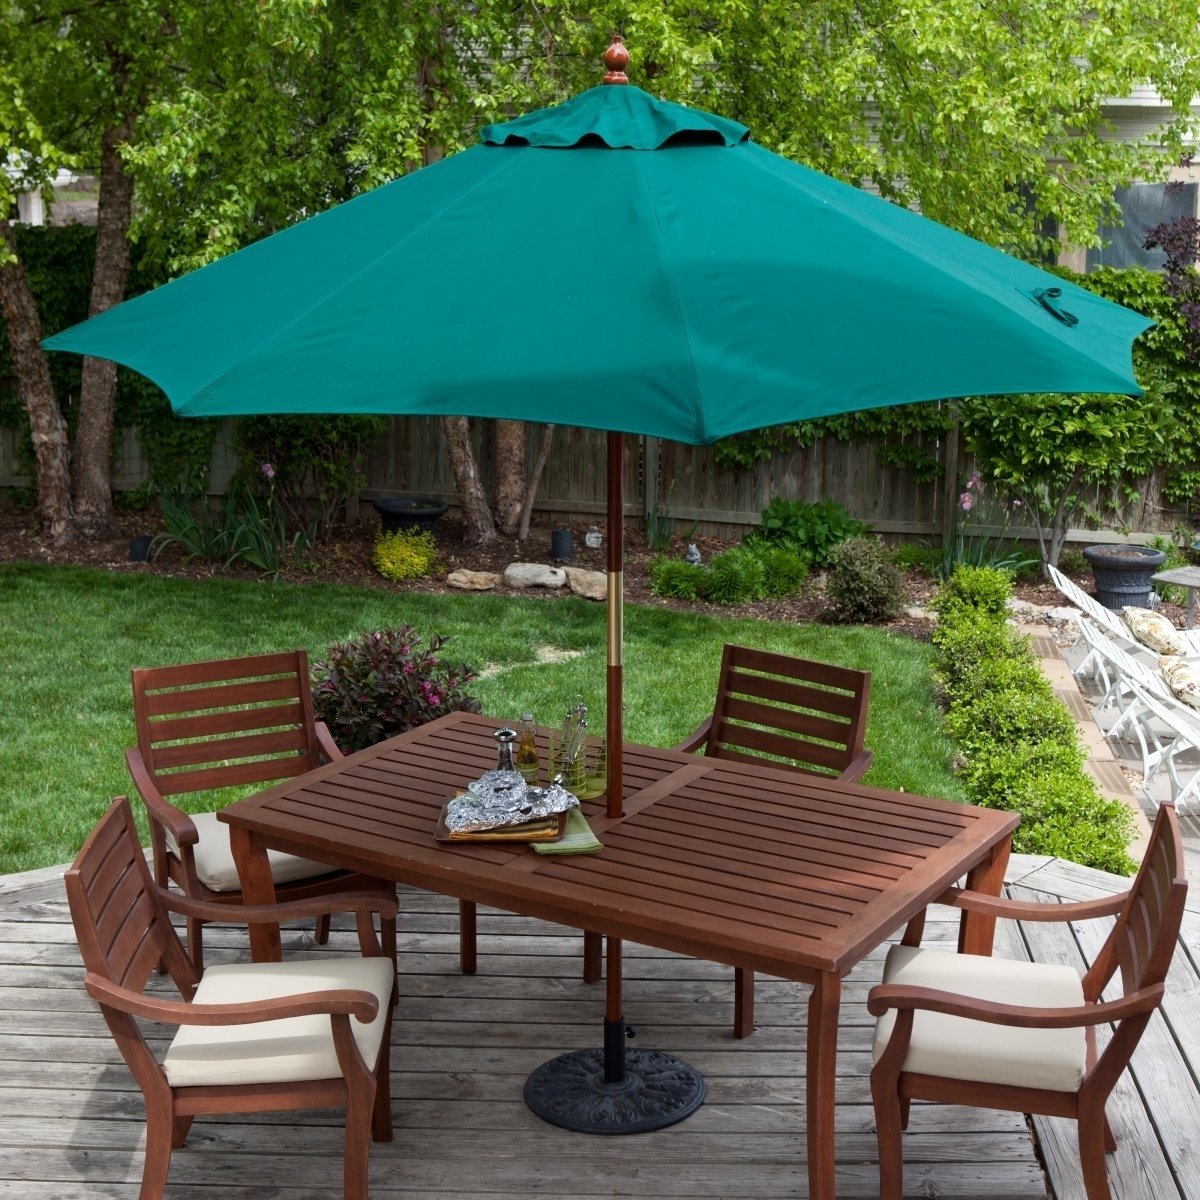 Fashionable Patio Tables With Umbrella Hole Pertaining To Patio Table With Umbrella (Gallery 3 of 20)